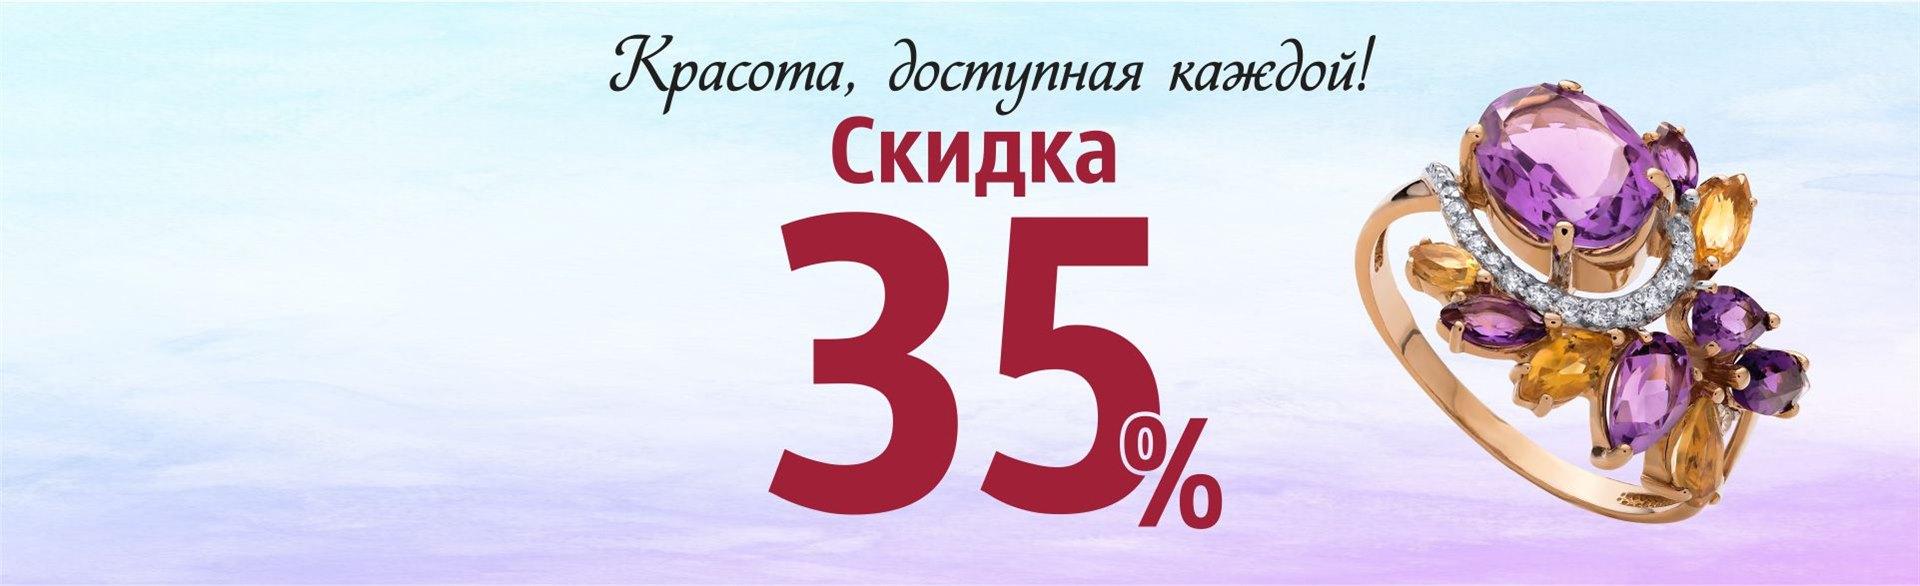 https://www.almazcom.ru/pub/img/QA/actions/skidka_35_ot_postavshhika_2020.jpg